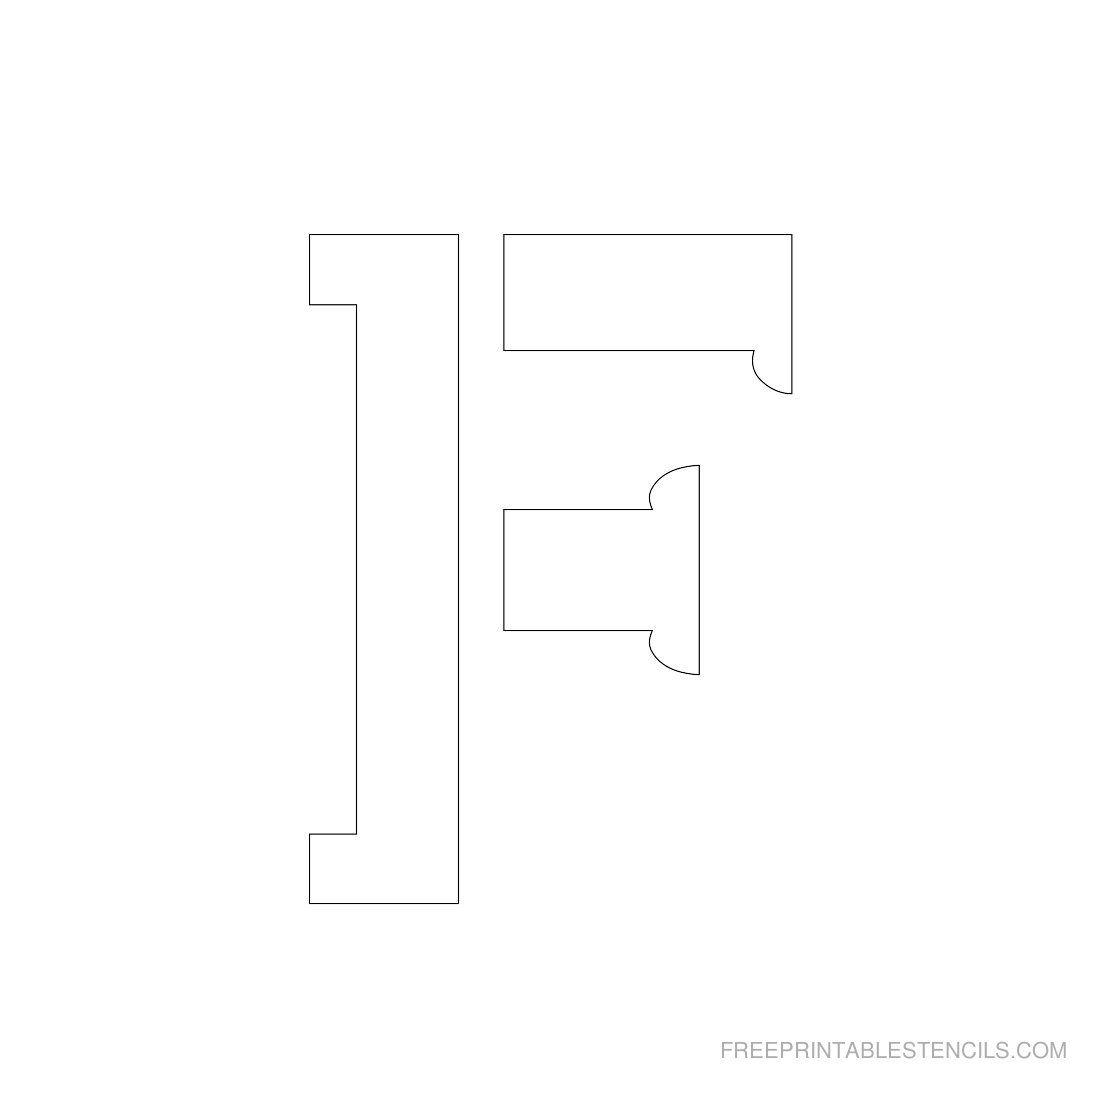 Printable 3 Inch Letter Stencils A Z Letter Stencils Letter Stencils To Print Letter Stencils Printables